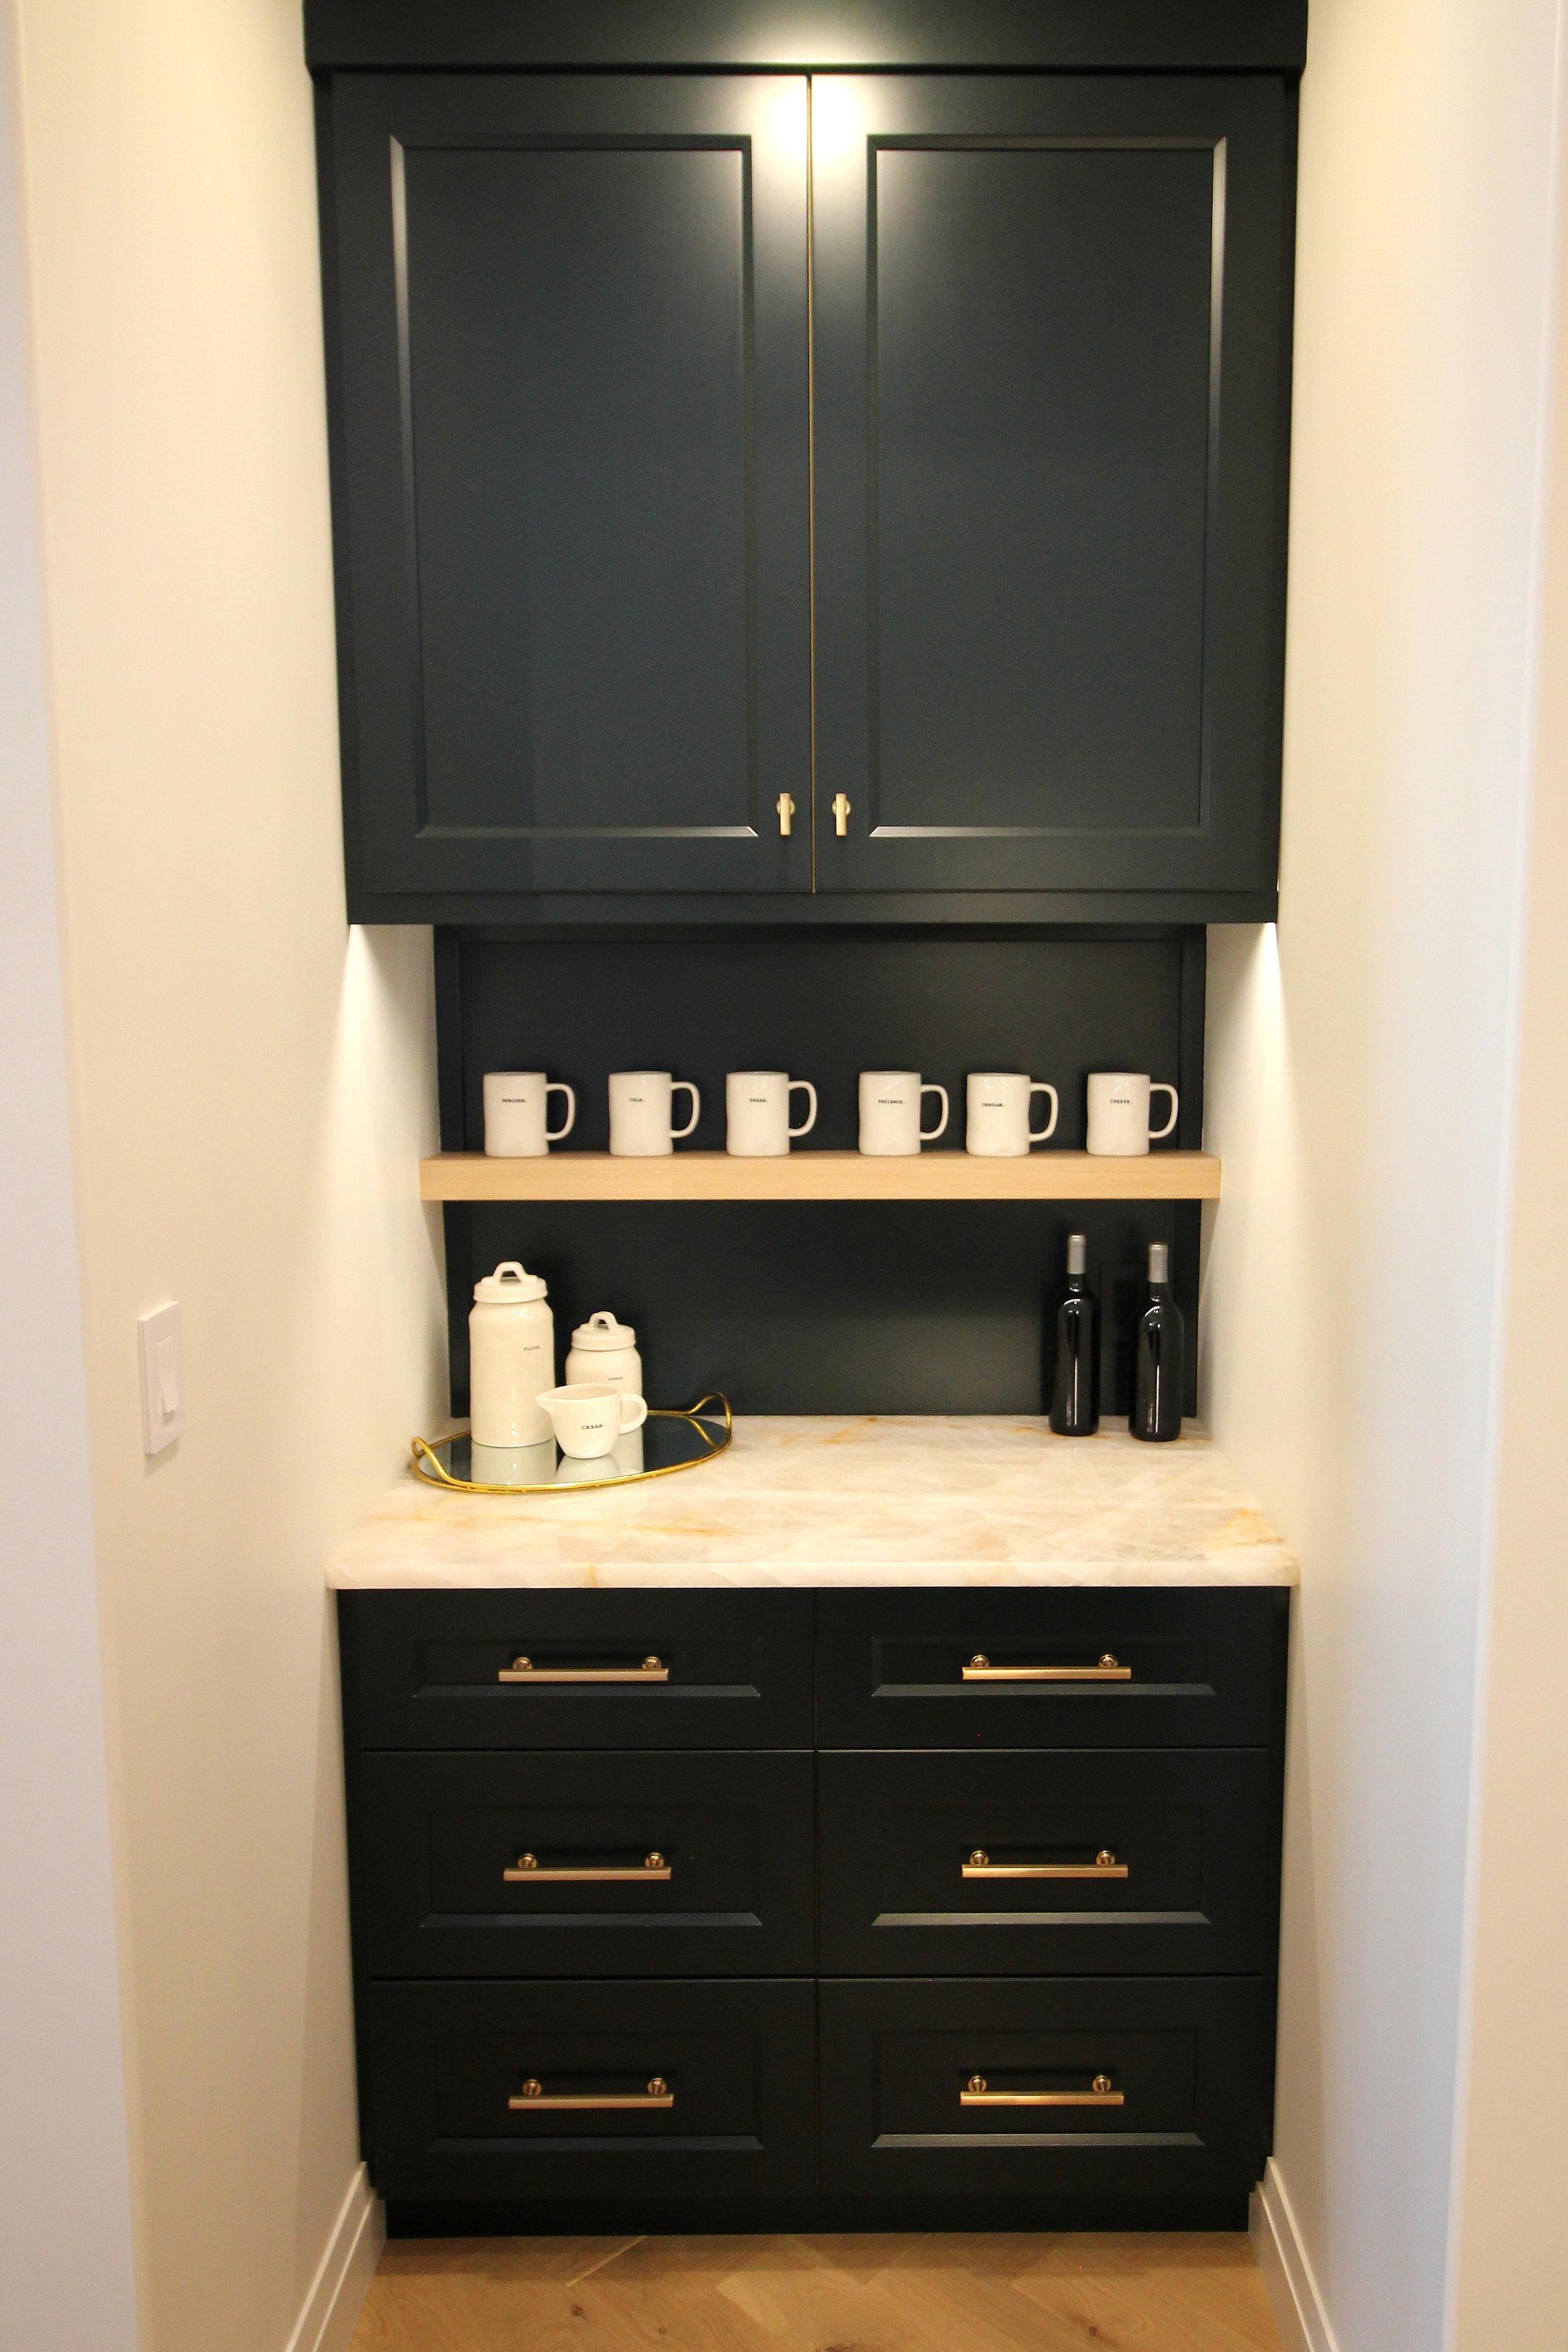 Benjamin Moore Black Forest Green cabinets, white oak, quartzite